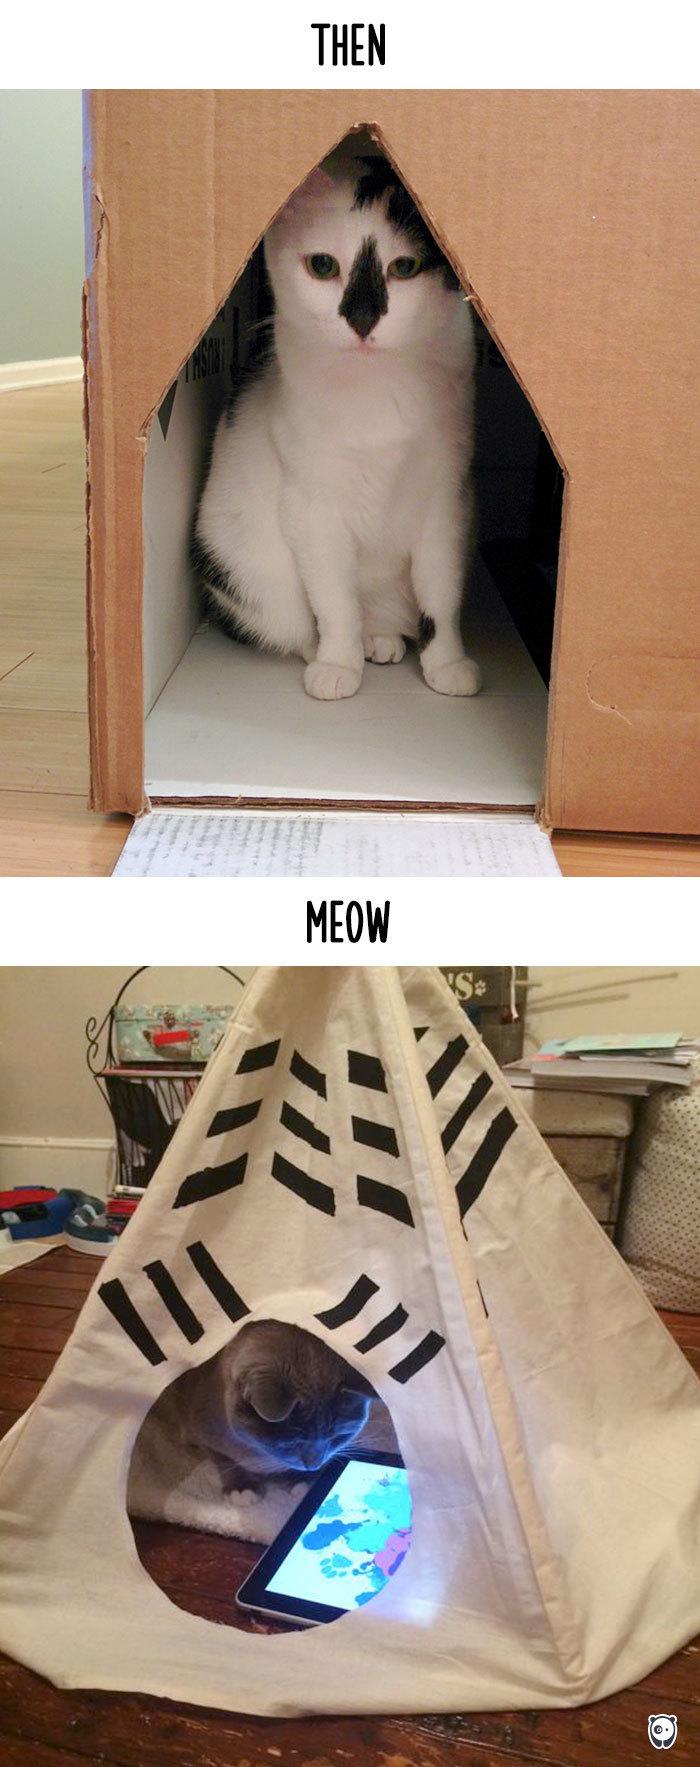 12-cats-change-life